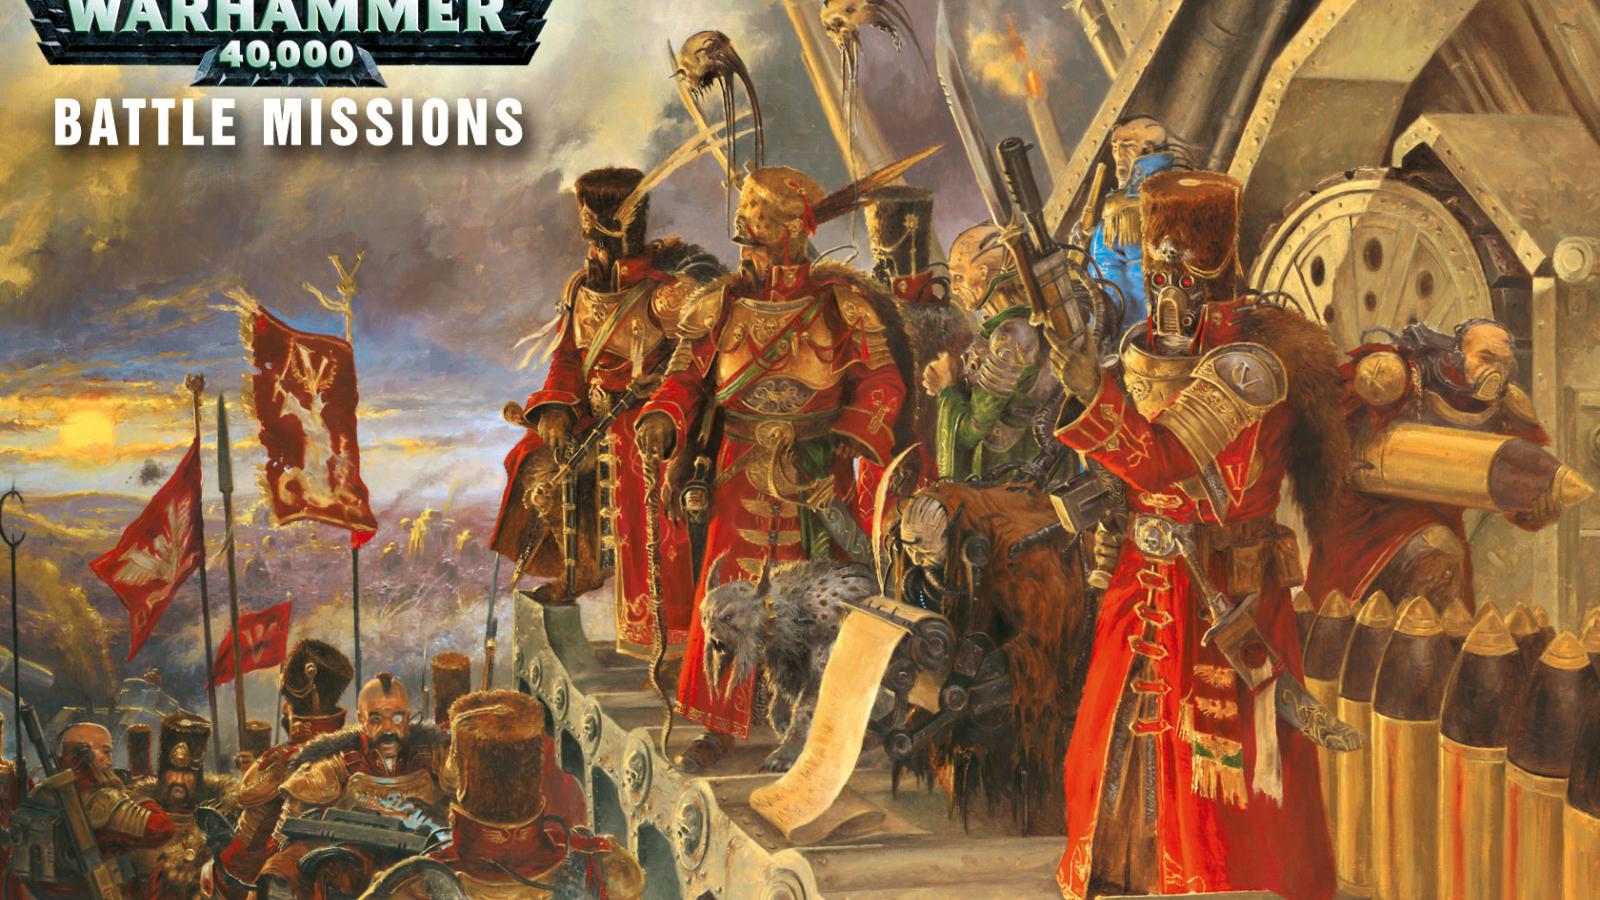 Free Download Warhammer 40k Wallpaper Imperial Guard Warhammer 40k